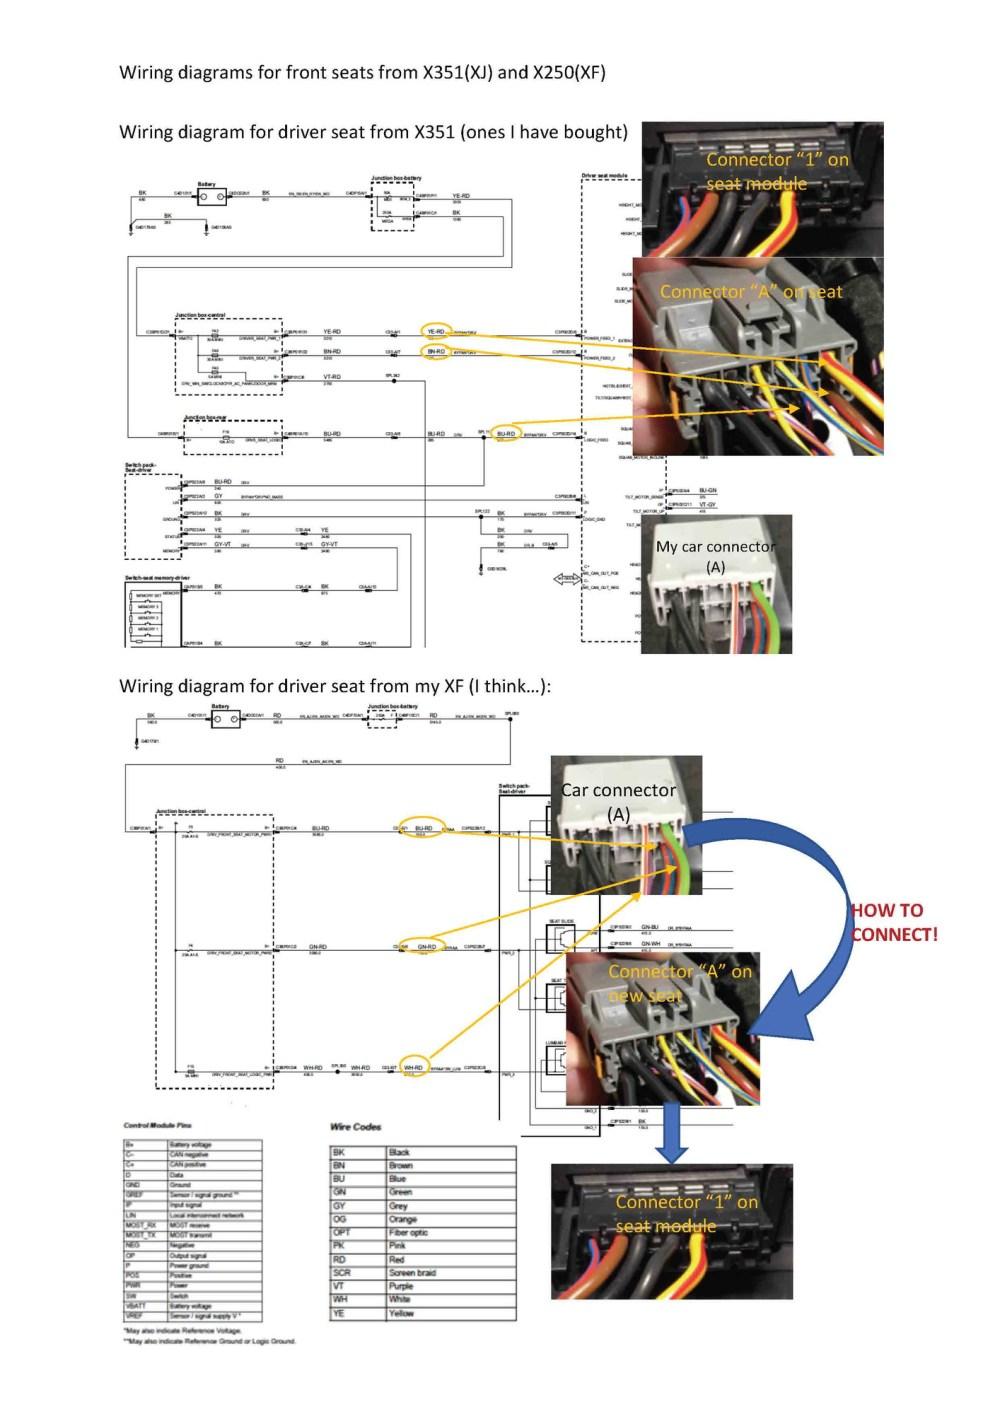 medium resolution of jaguar xf seat wiring diagram front seat upgrade wiring problems need advice jaguar